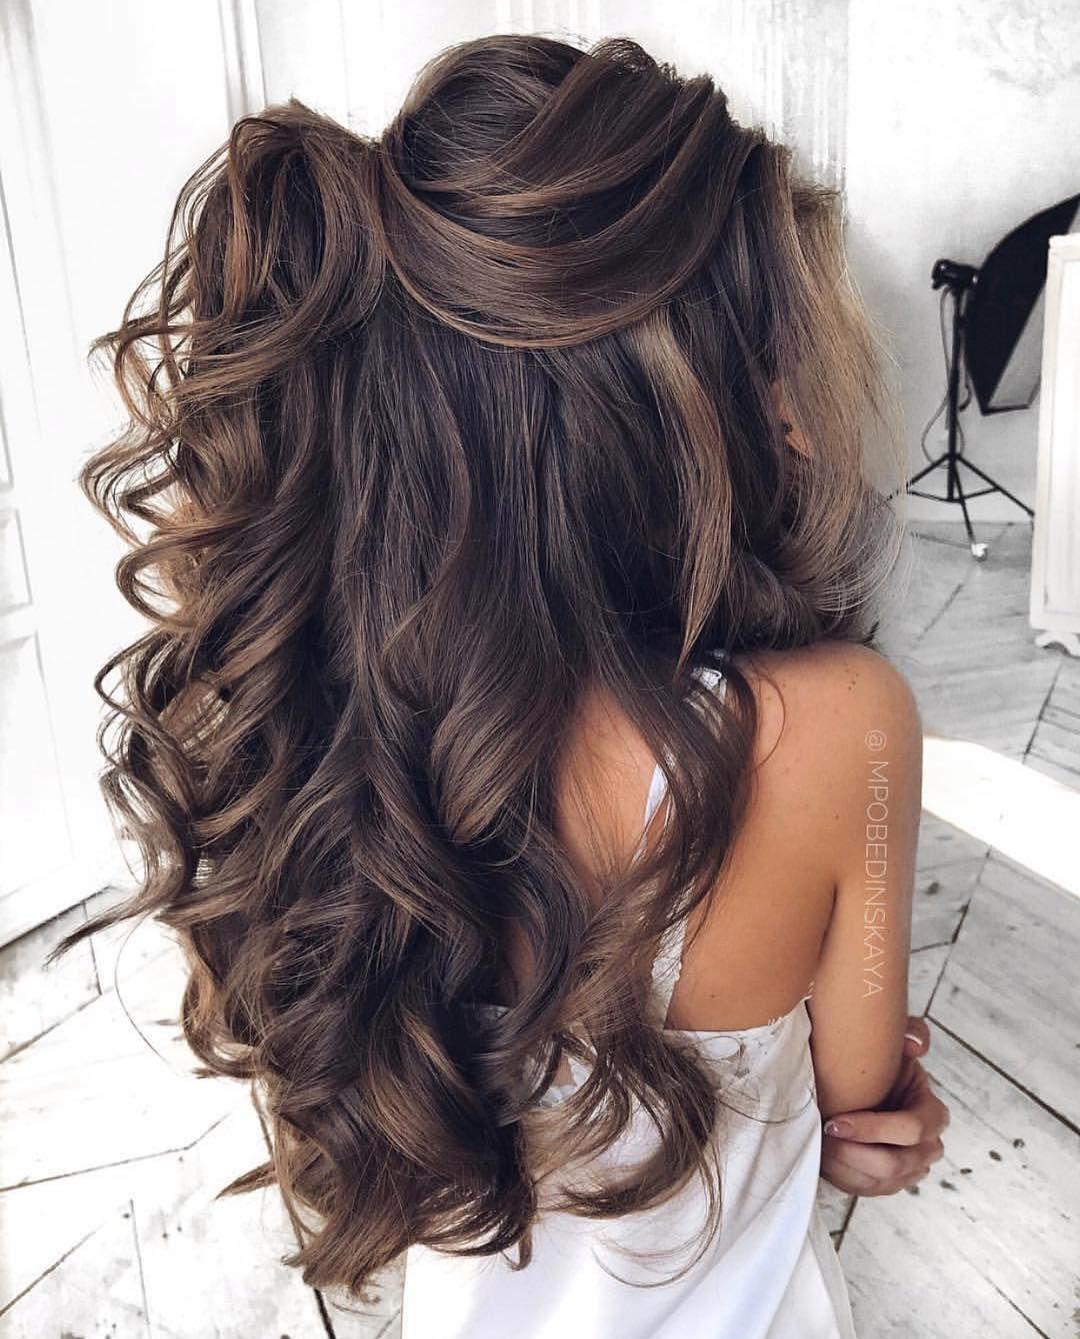 39 Gorgeous Half Up Half Down Hairstyles